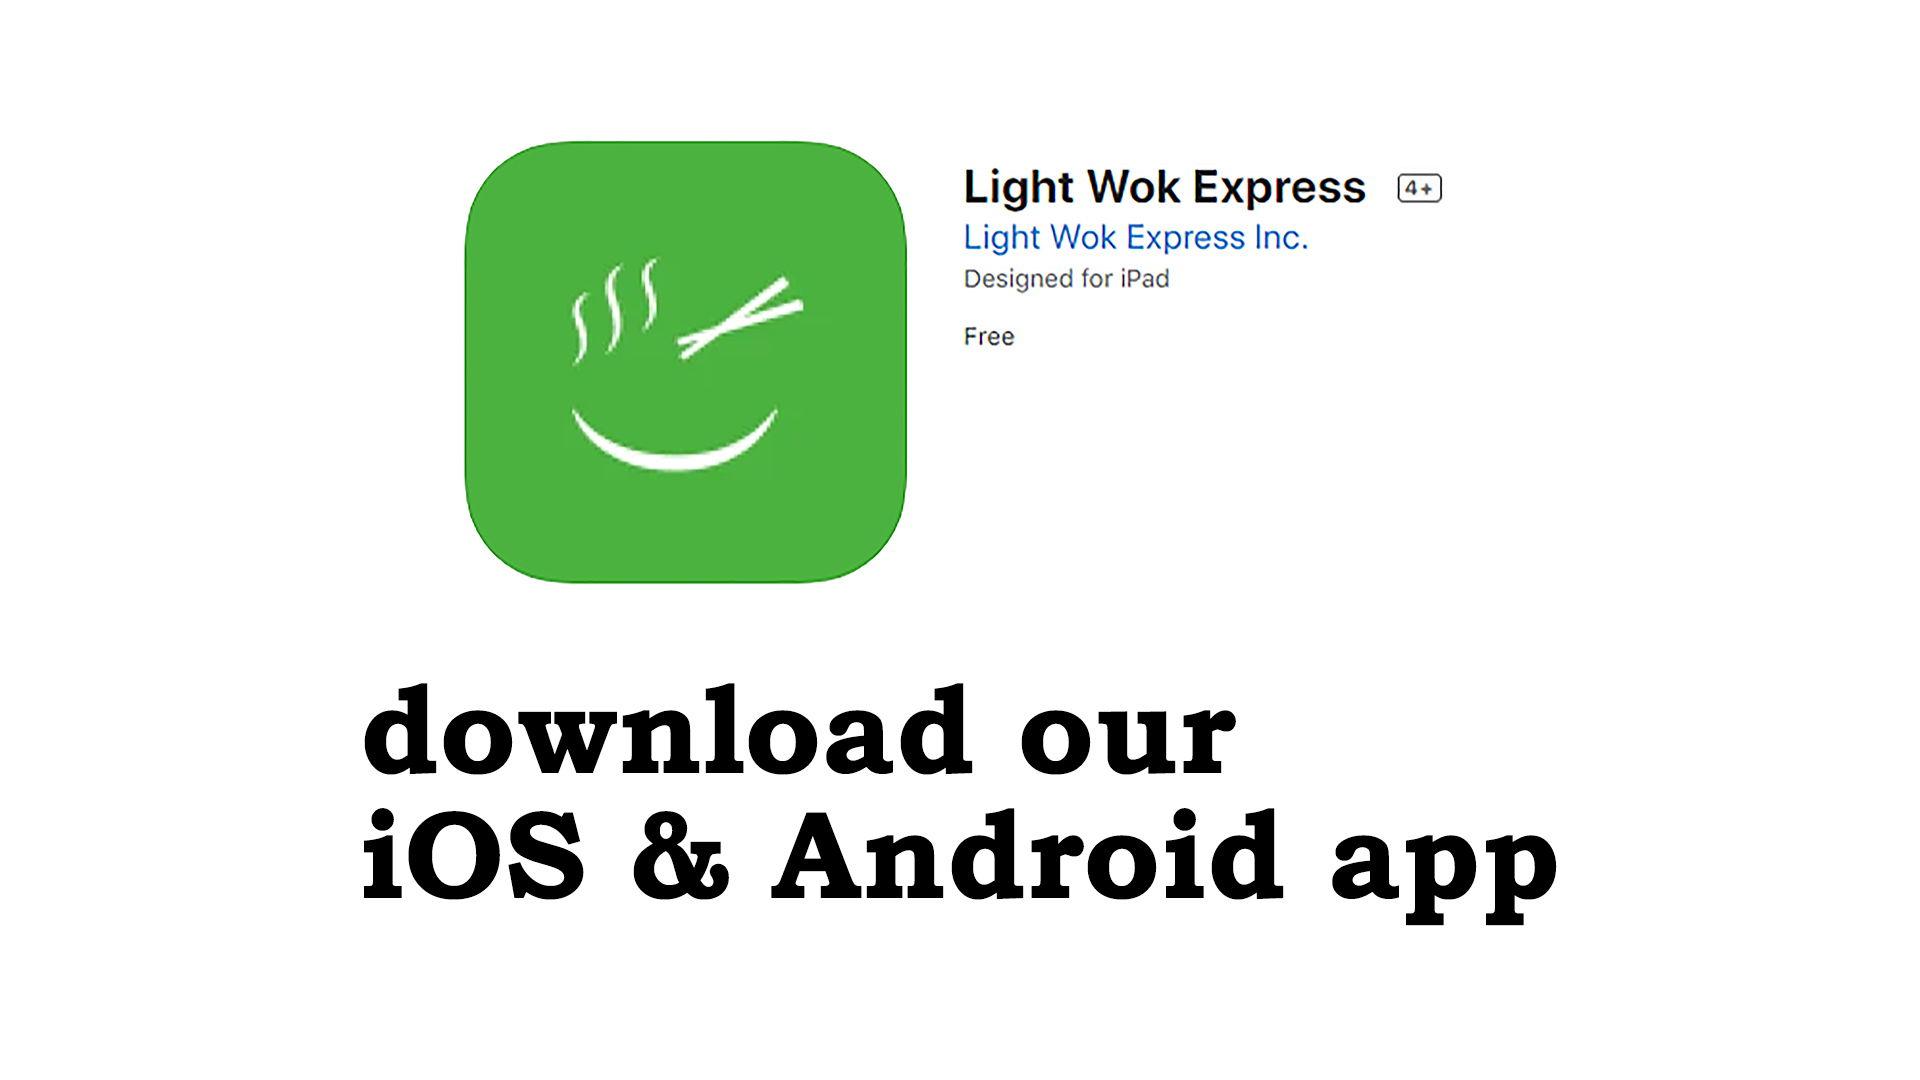 Logo - Light Wok Express - Pre Order Online, Pick Up in Store